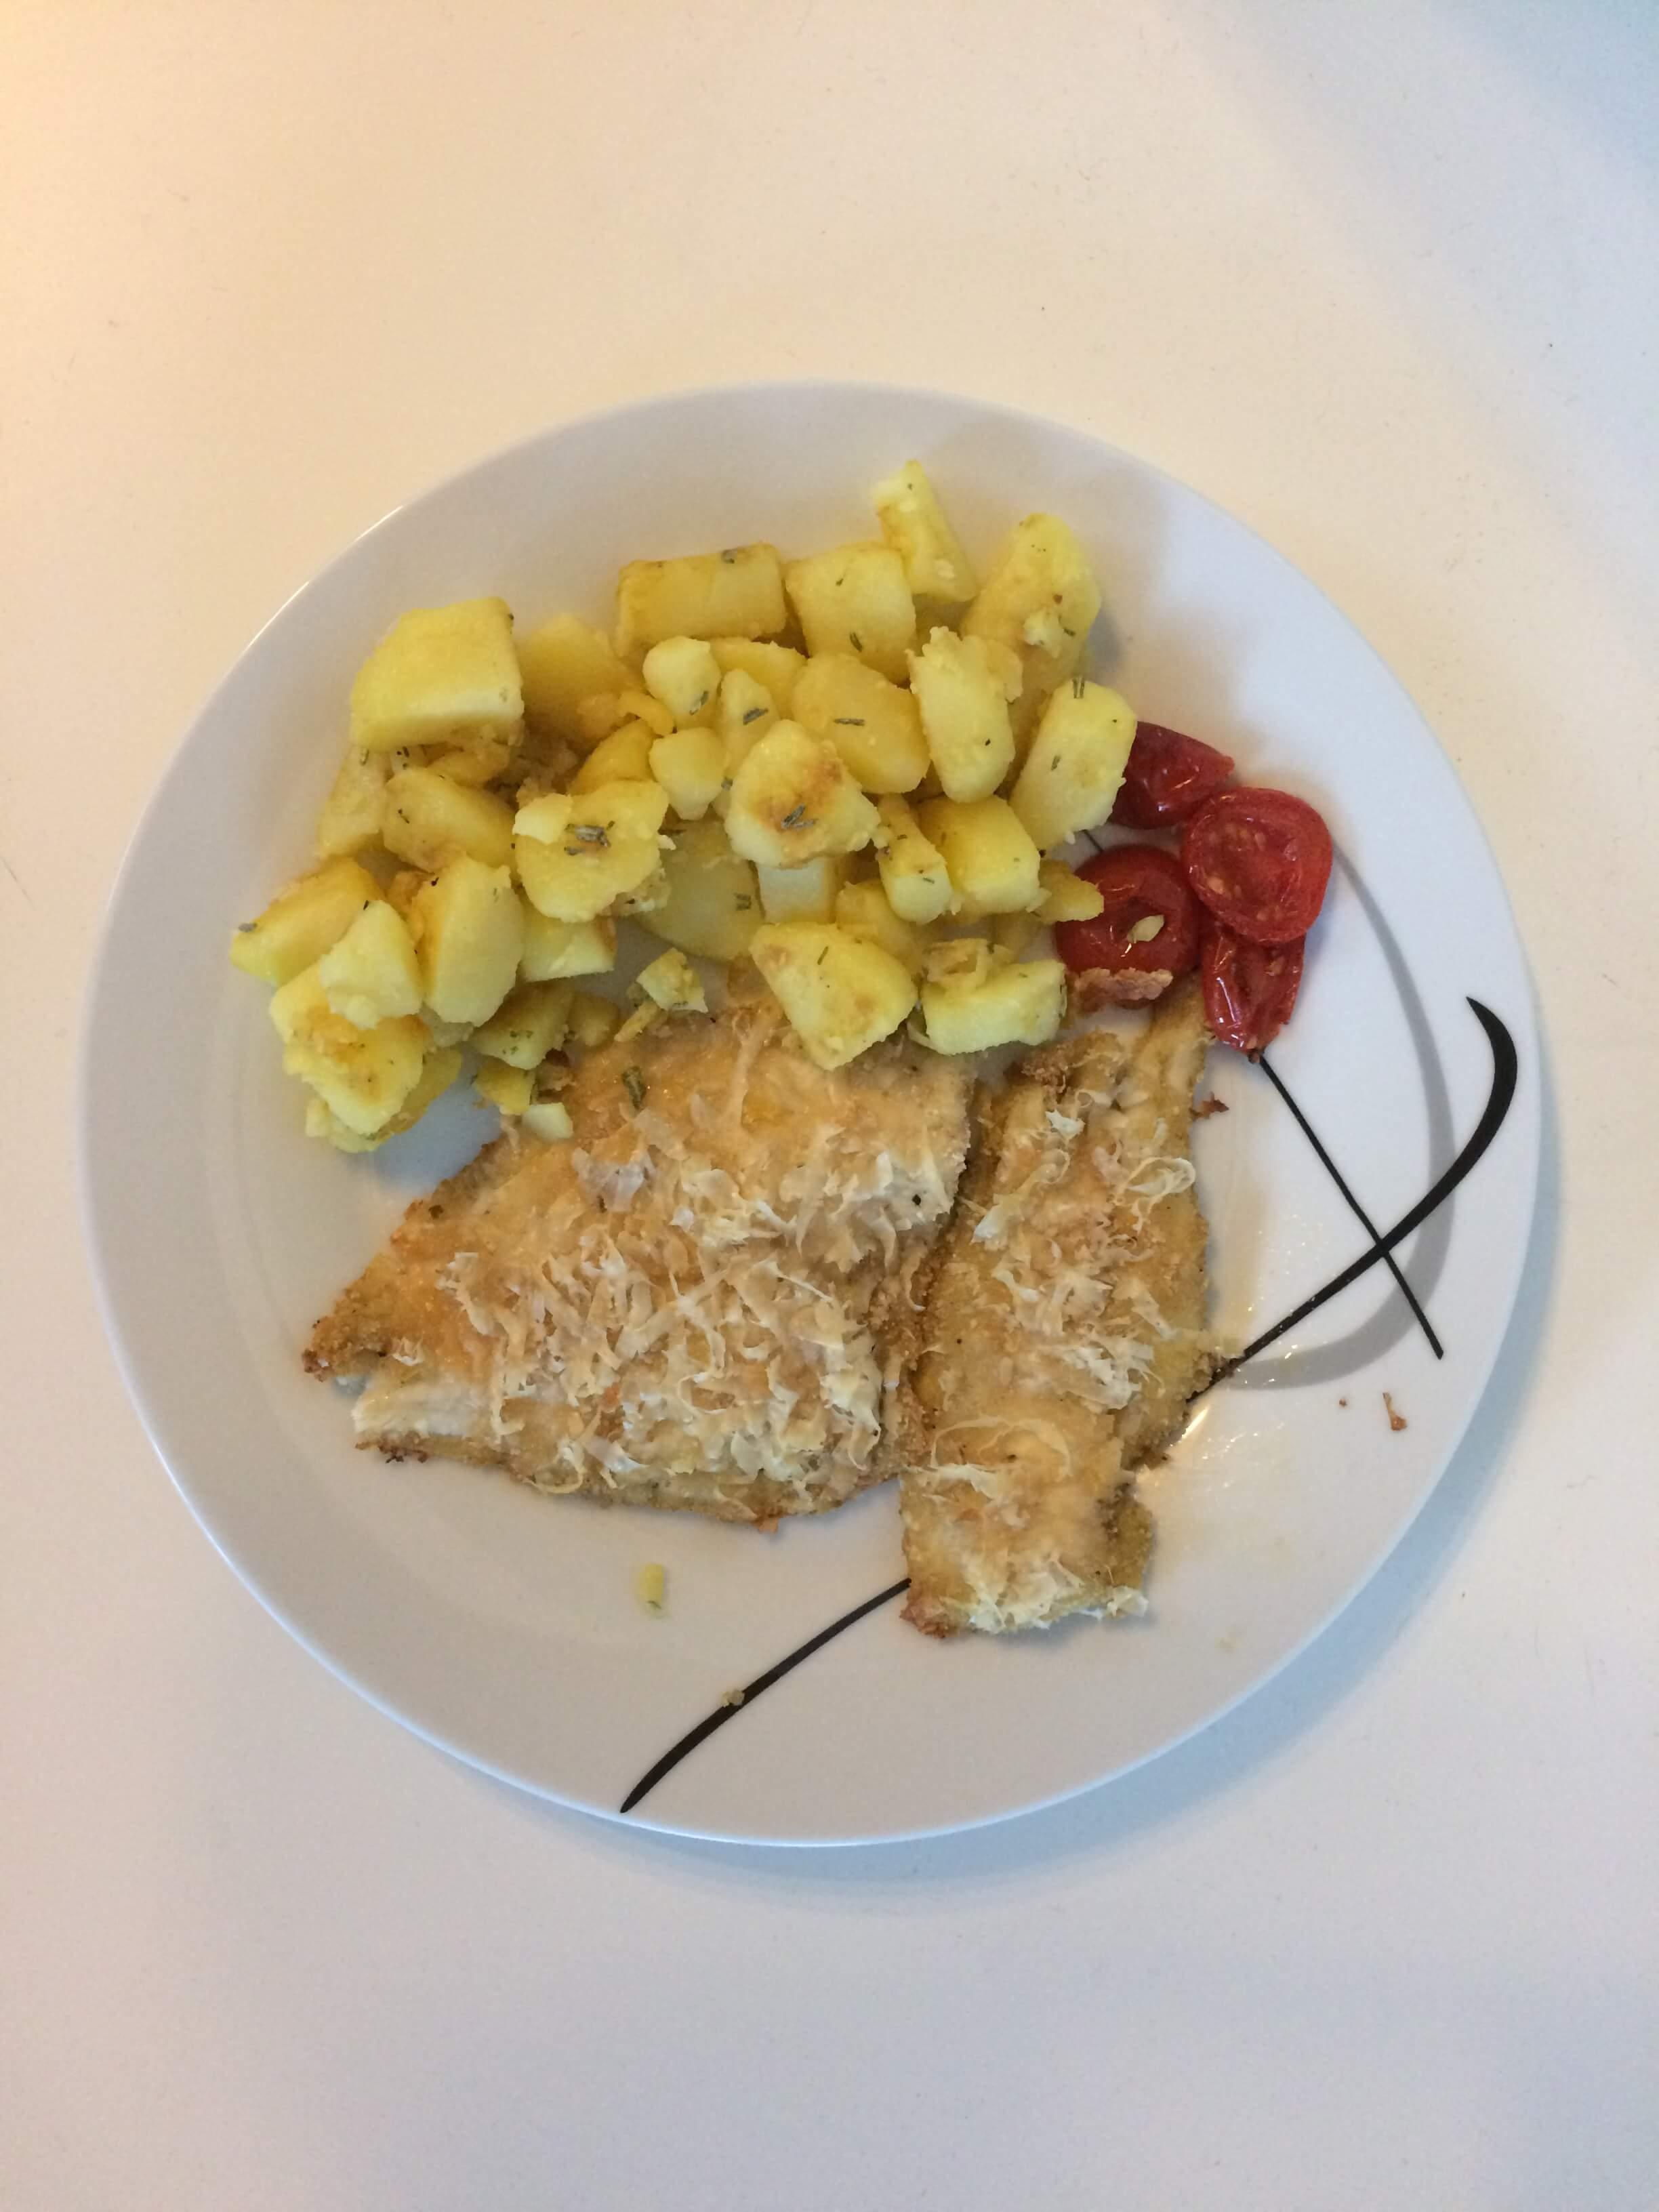 Fischfilet in Parmesankruste